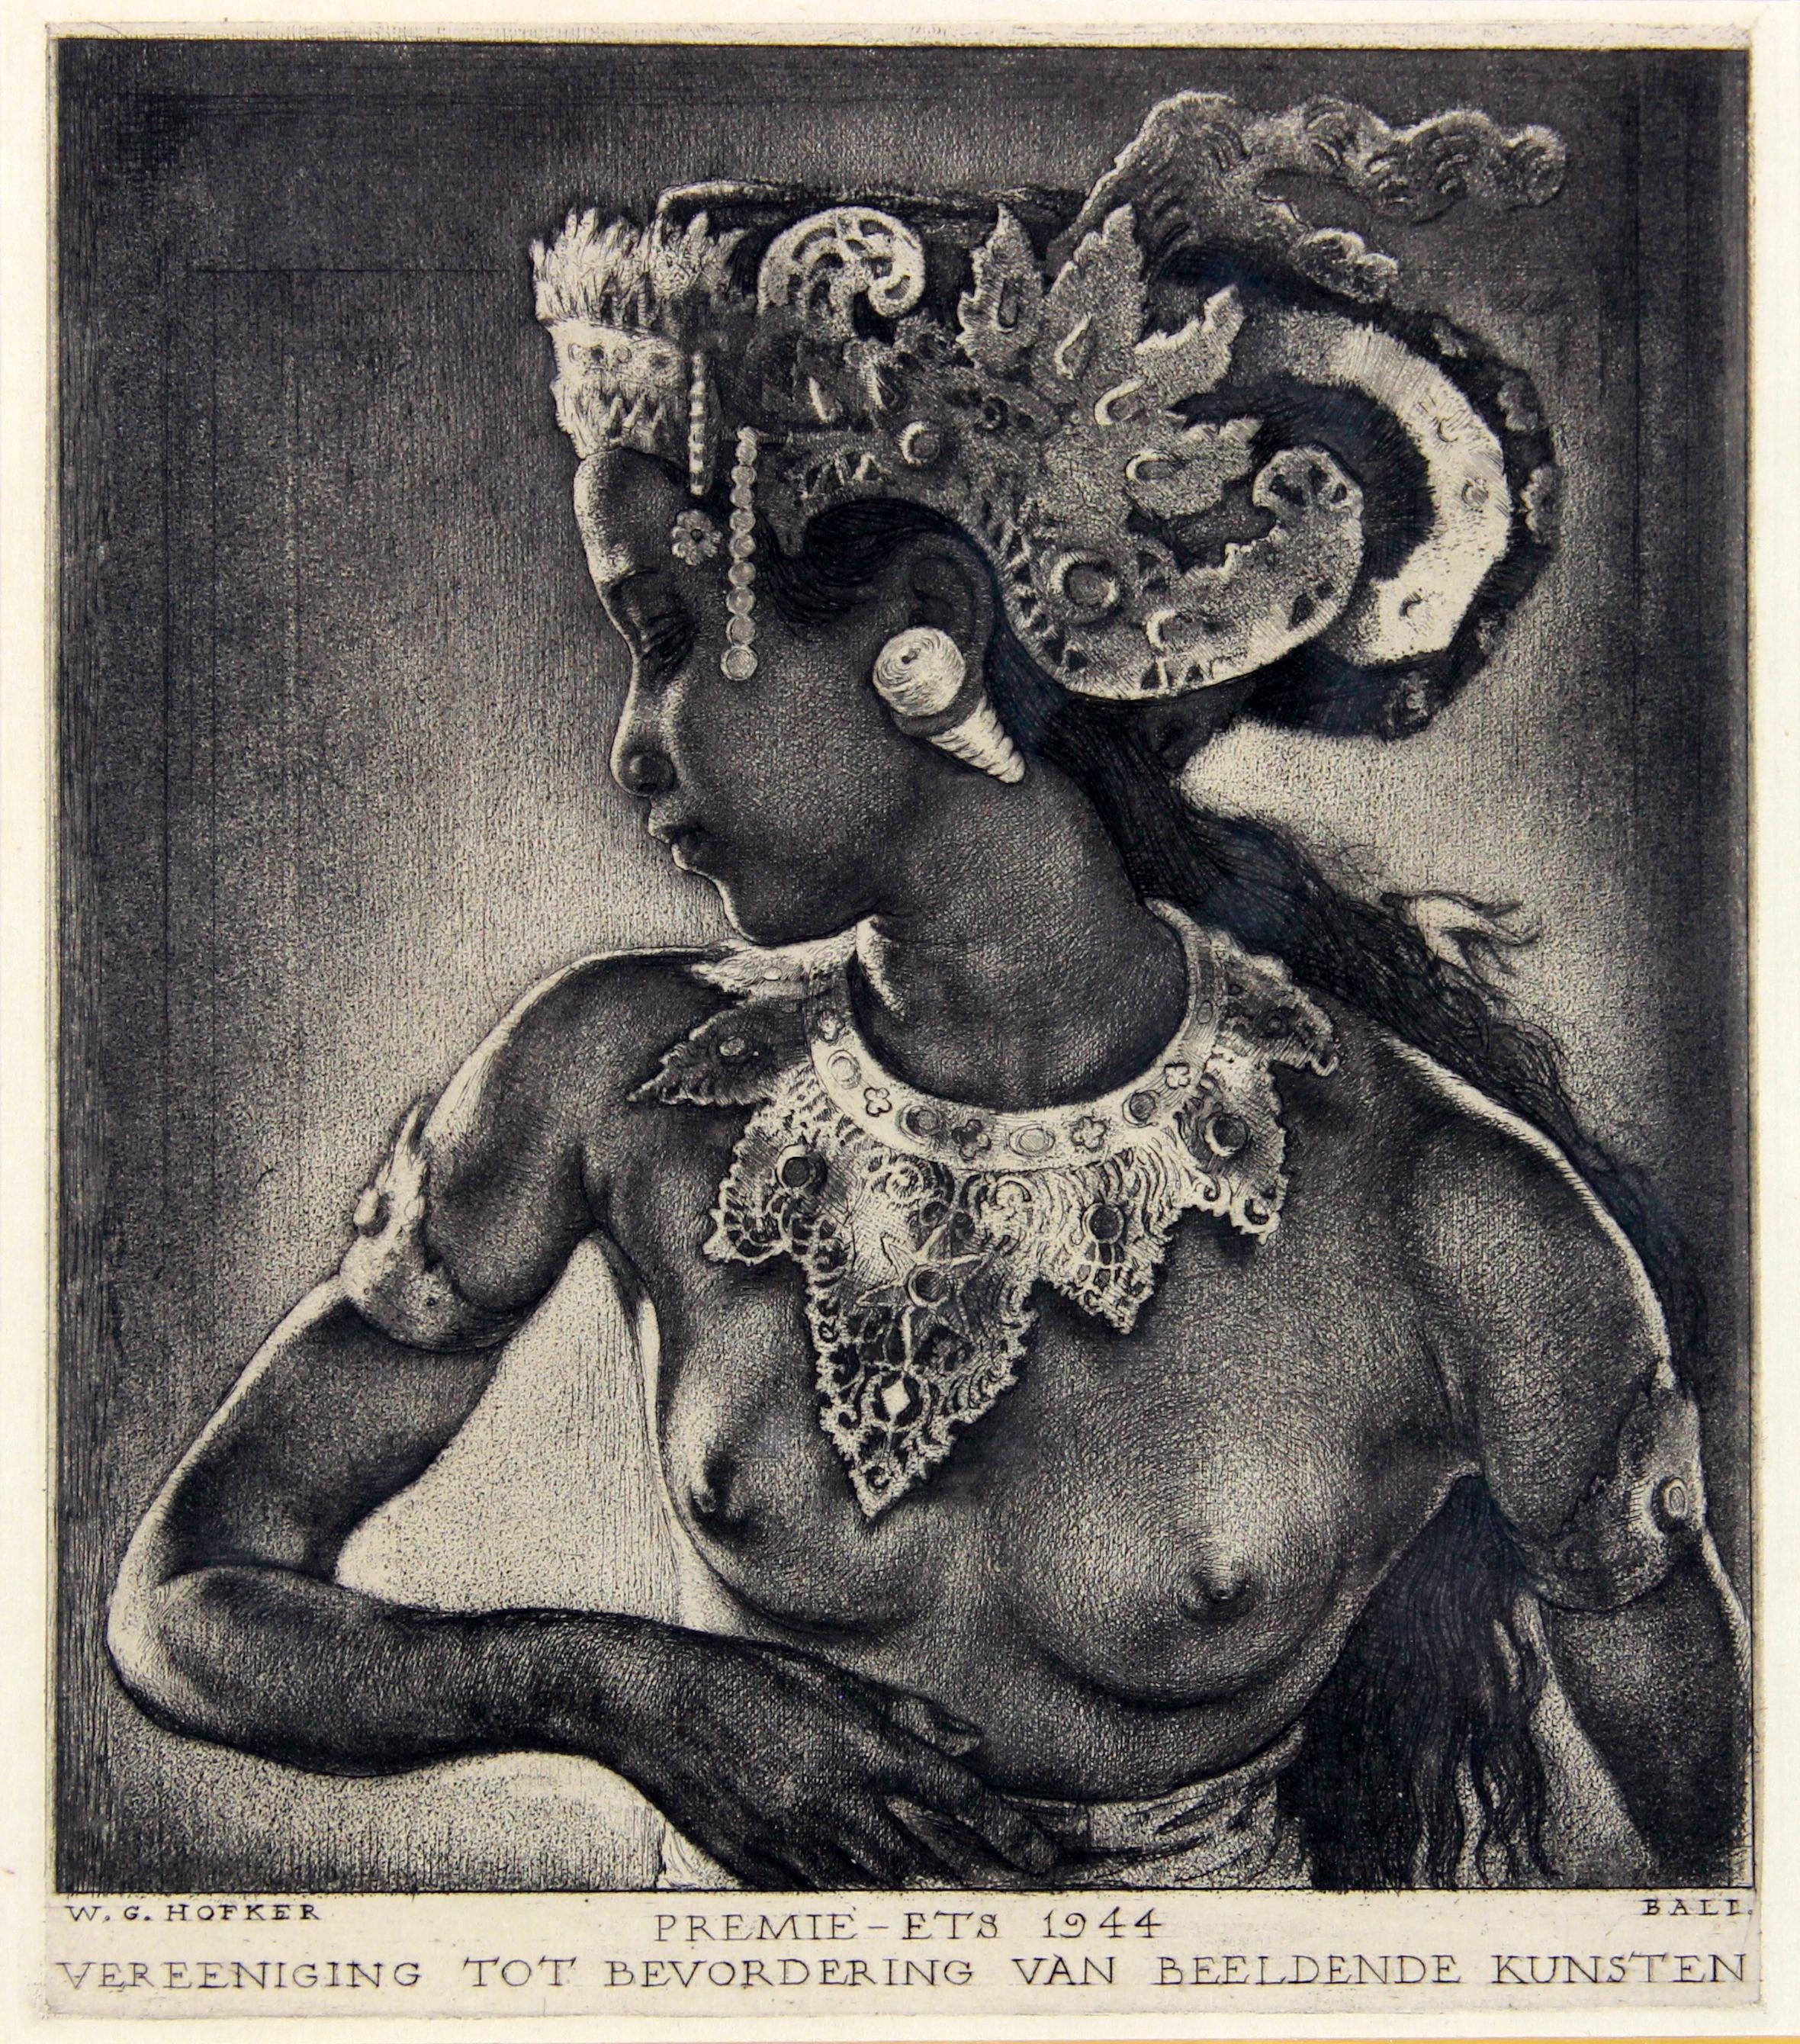 Balinese schone- Willem Gerard Hofker